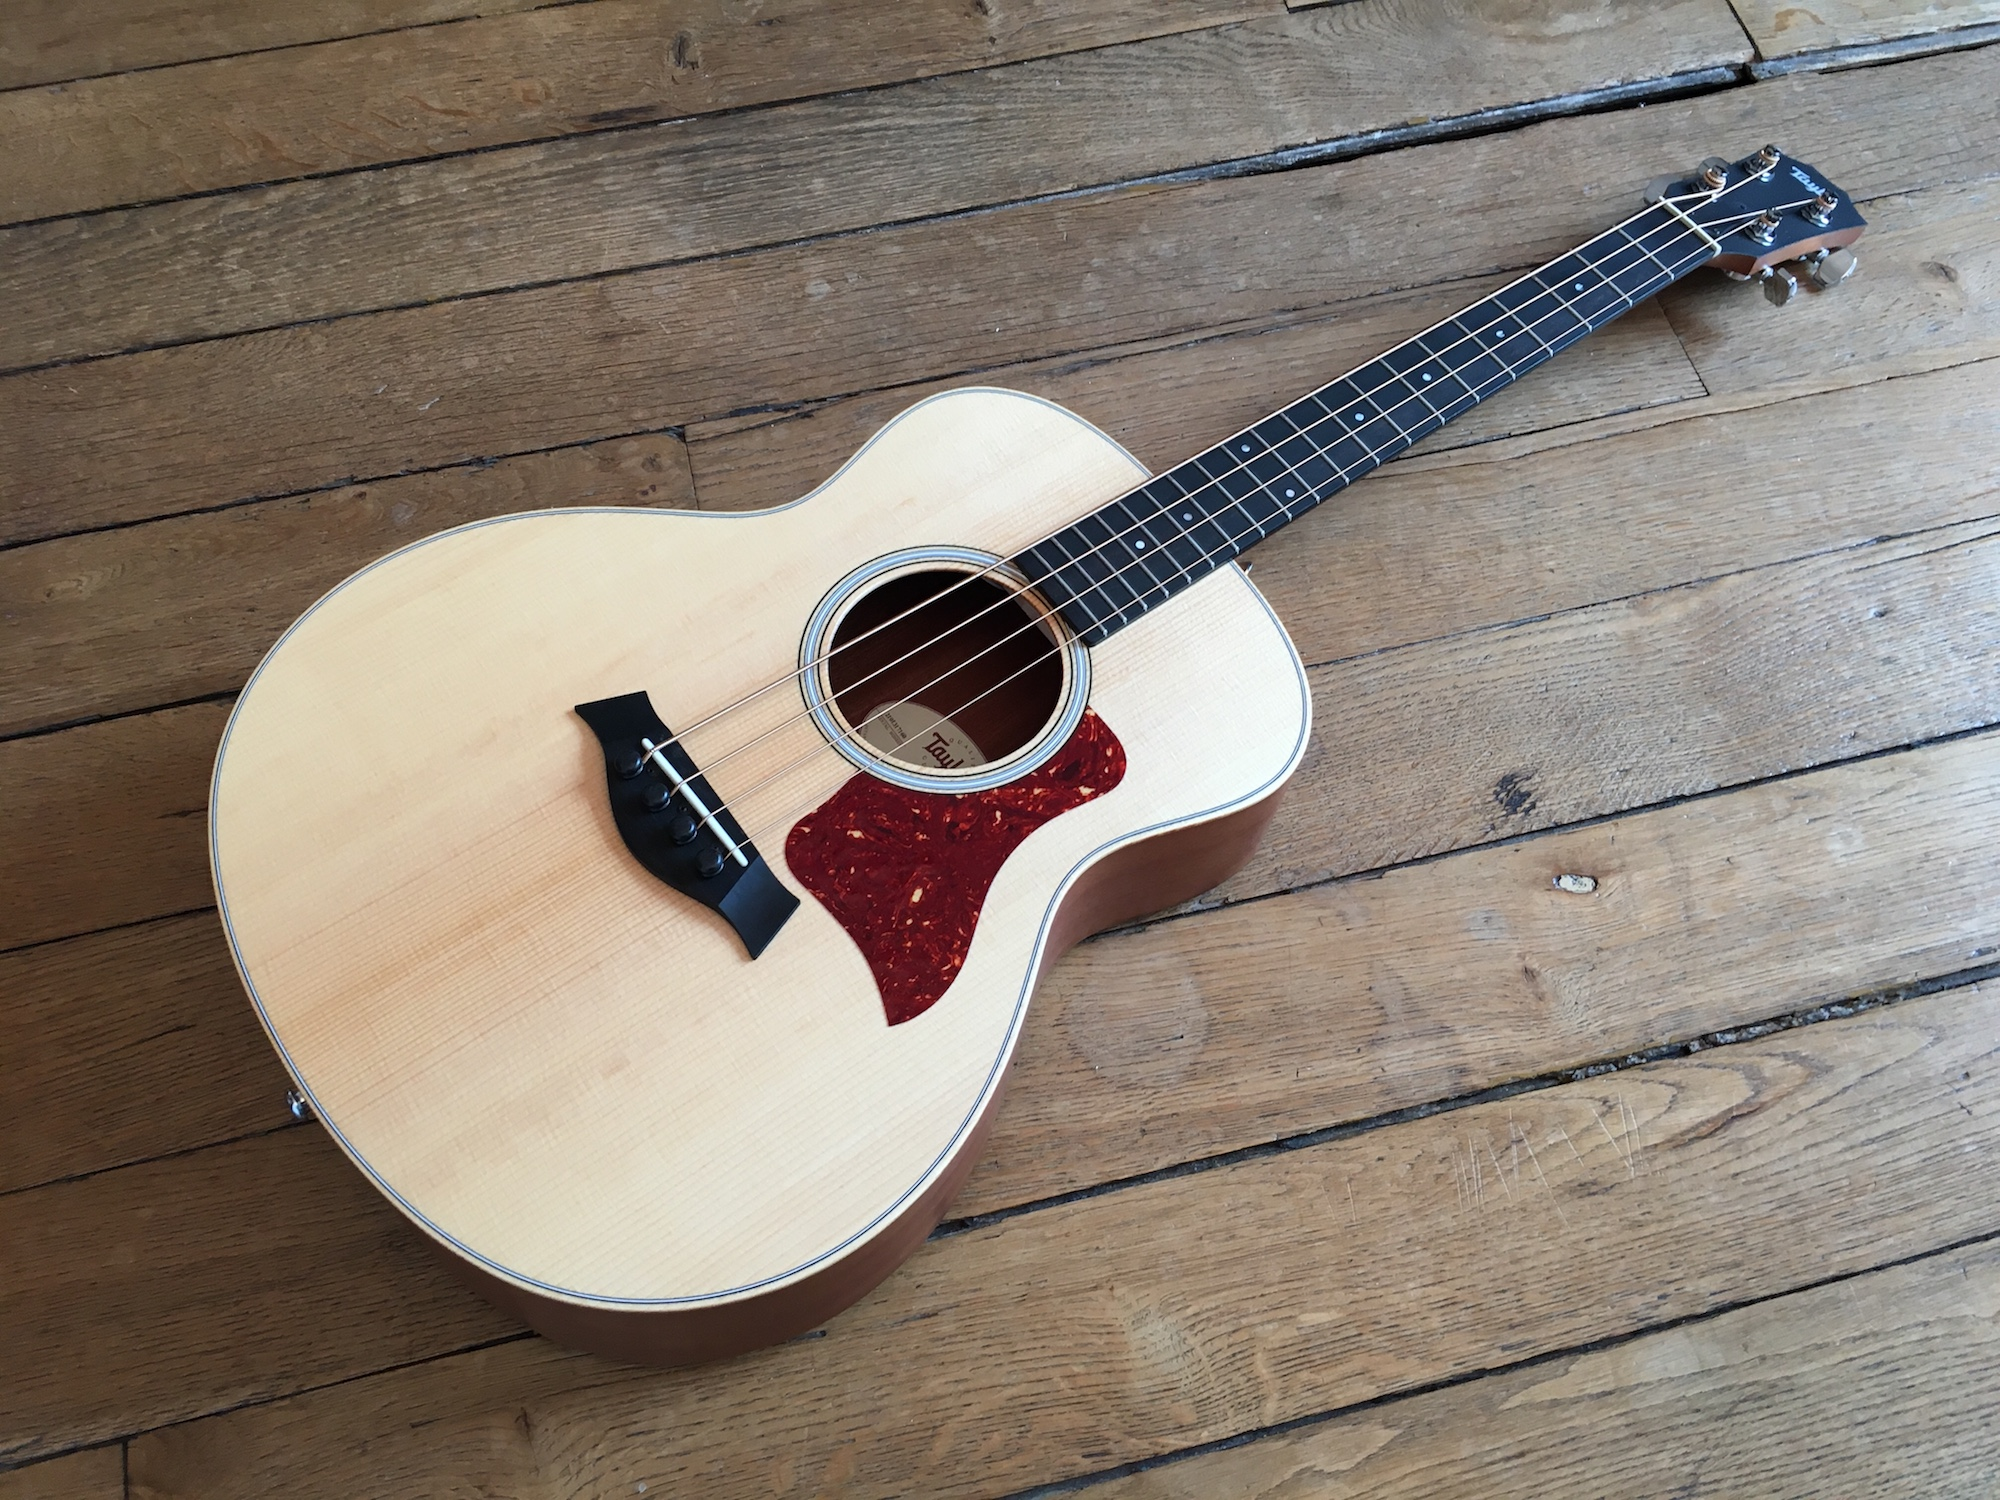 guitar review gs mini bass taylor guitars small format huge sound. Black Bedroom Furniture Sets. Home Design Ideas